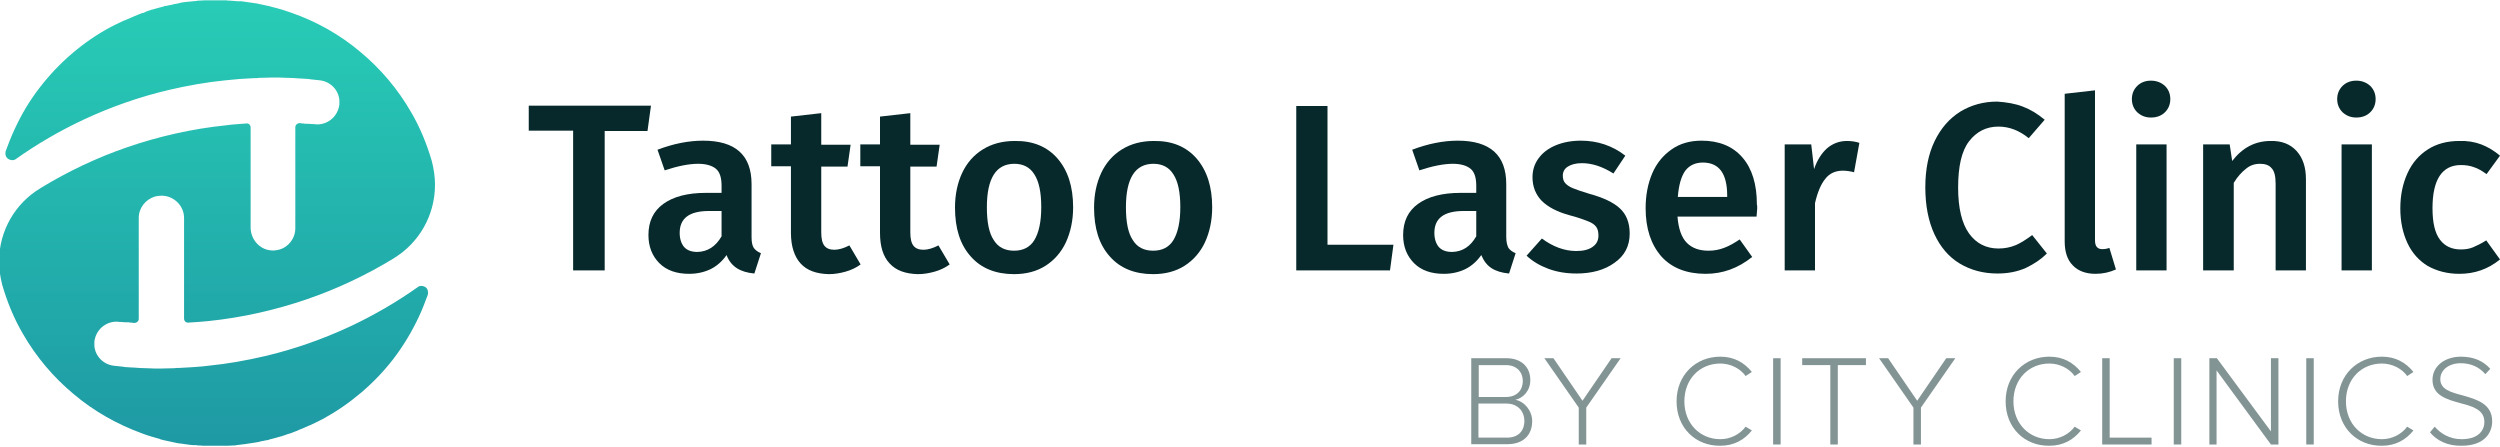 Tattoo Laser Clinic